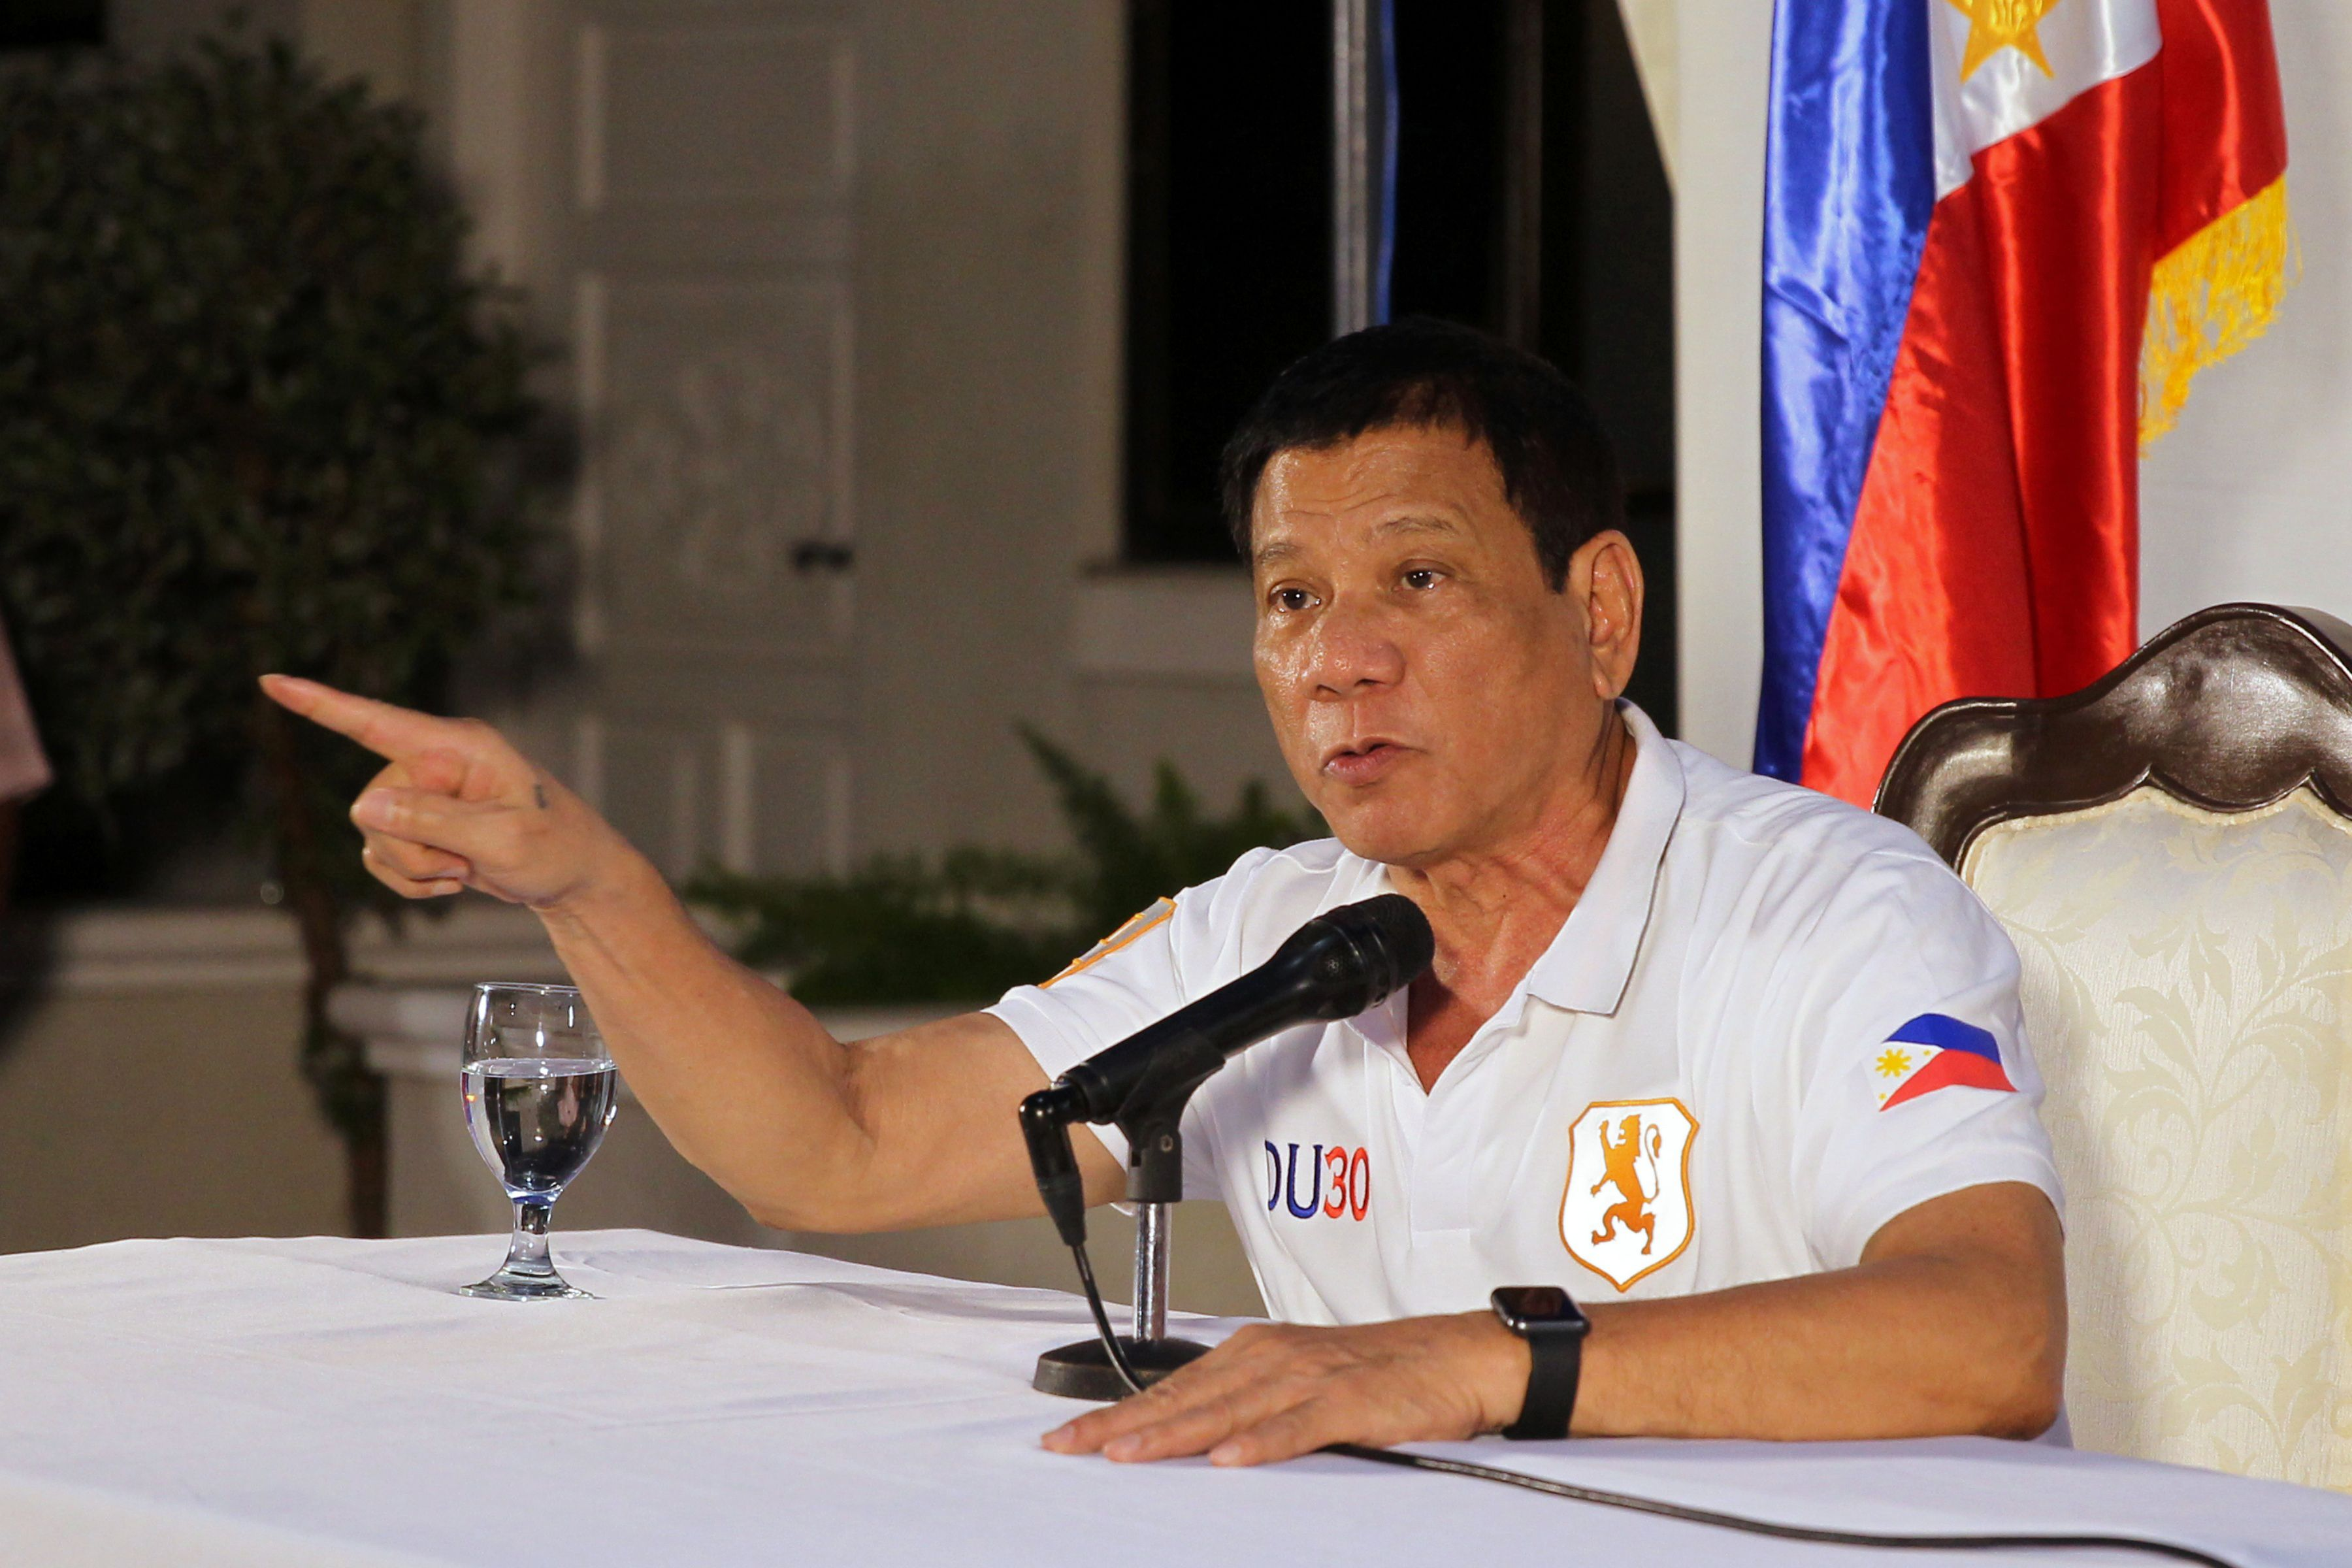 Duterte's reign of terror